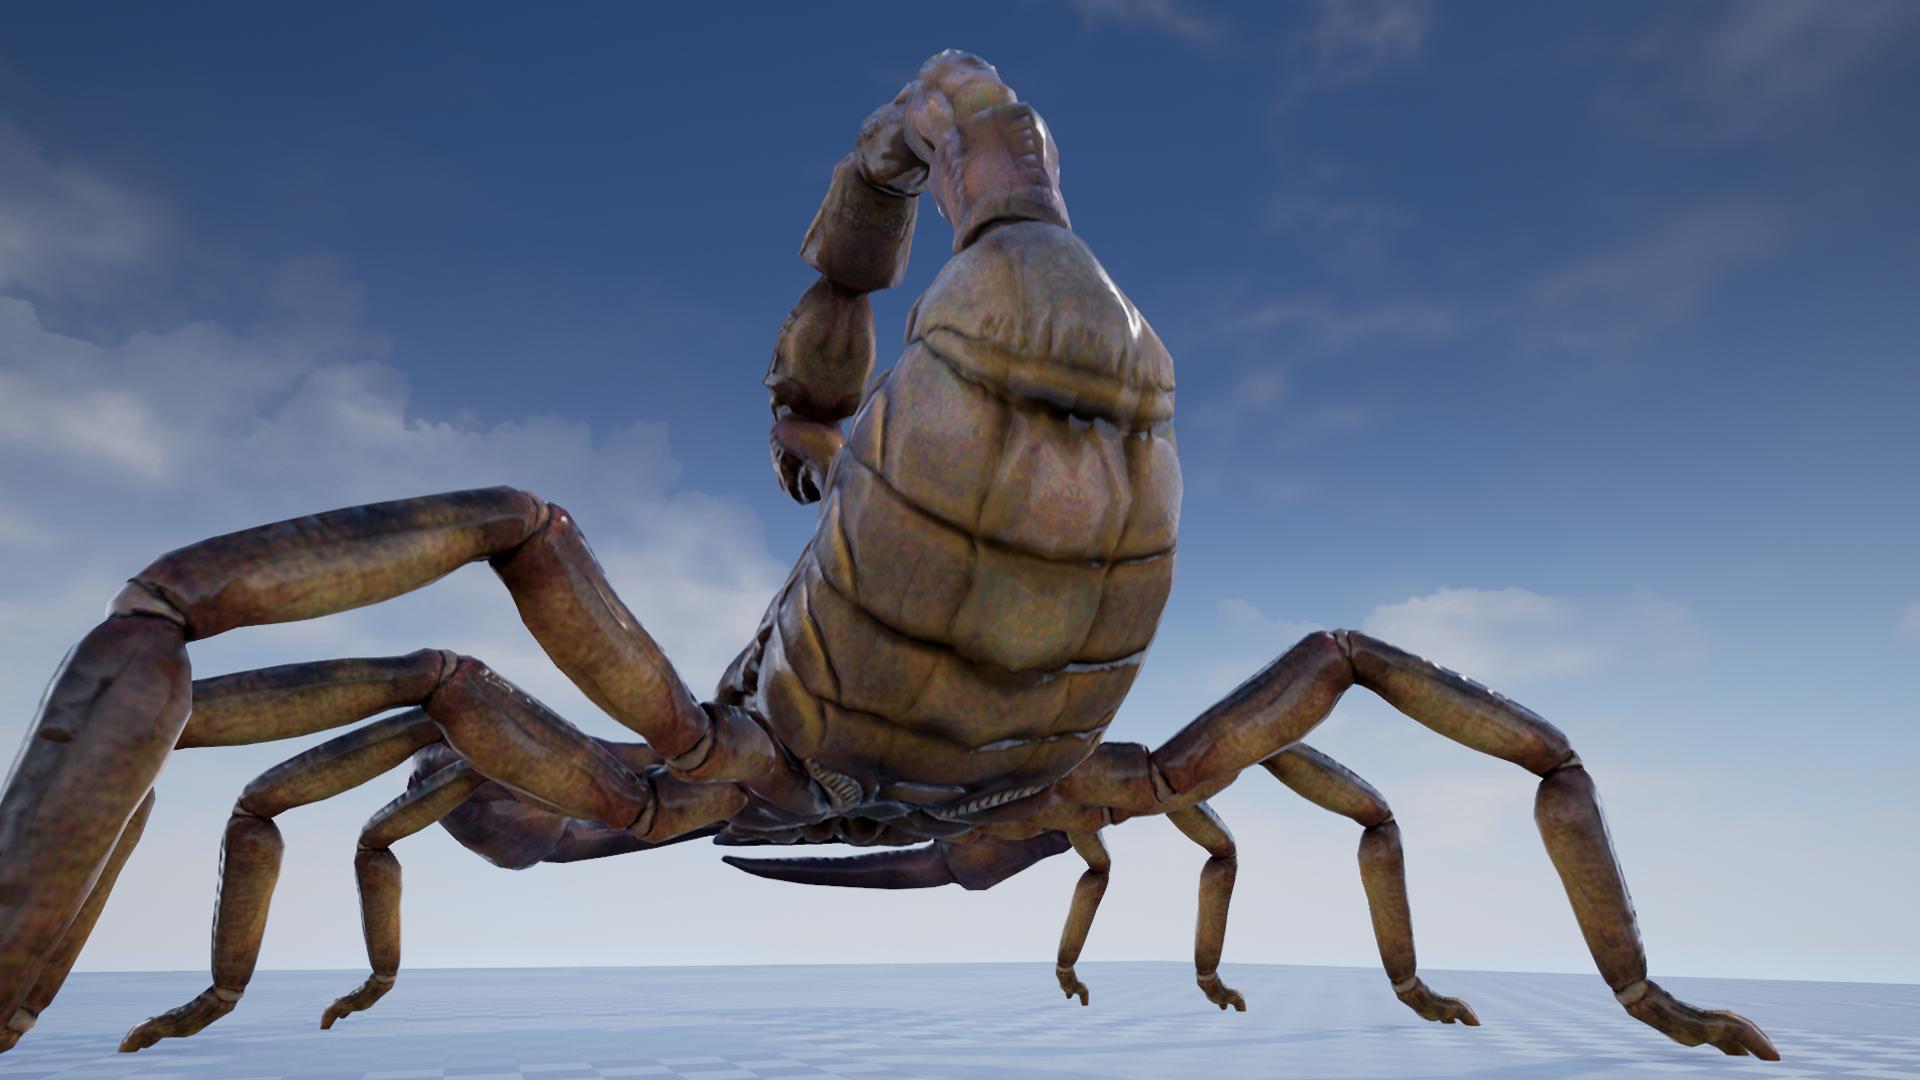 Giant hairy desert scorpions